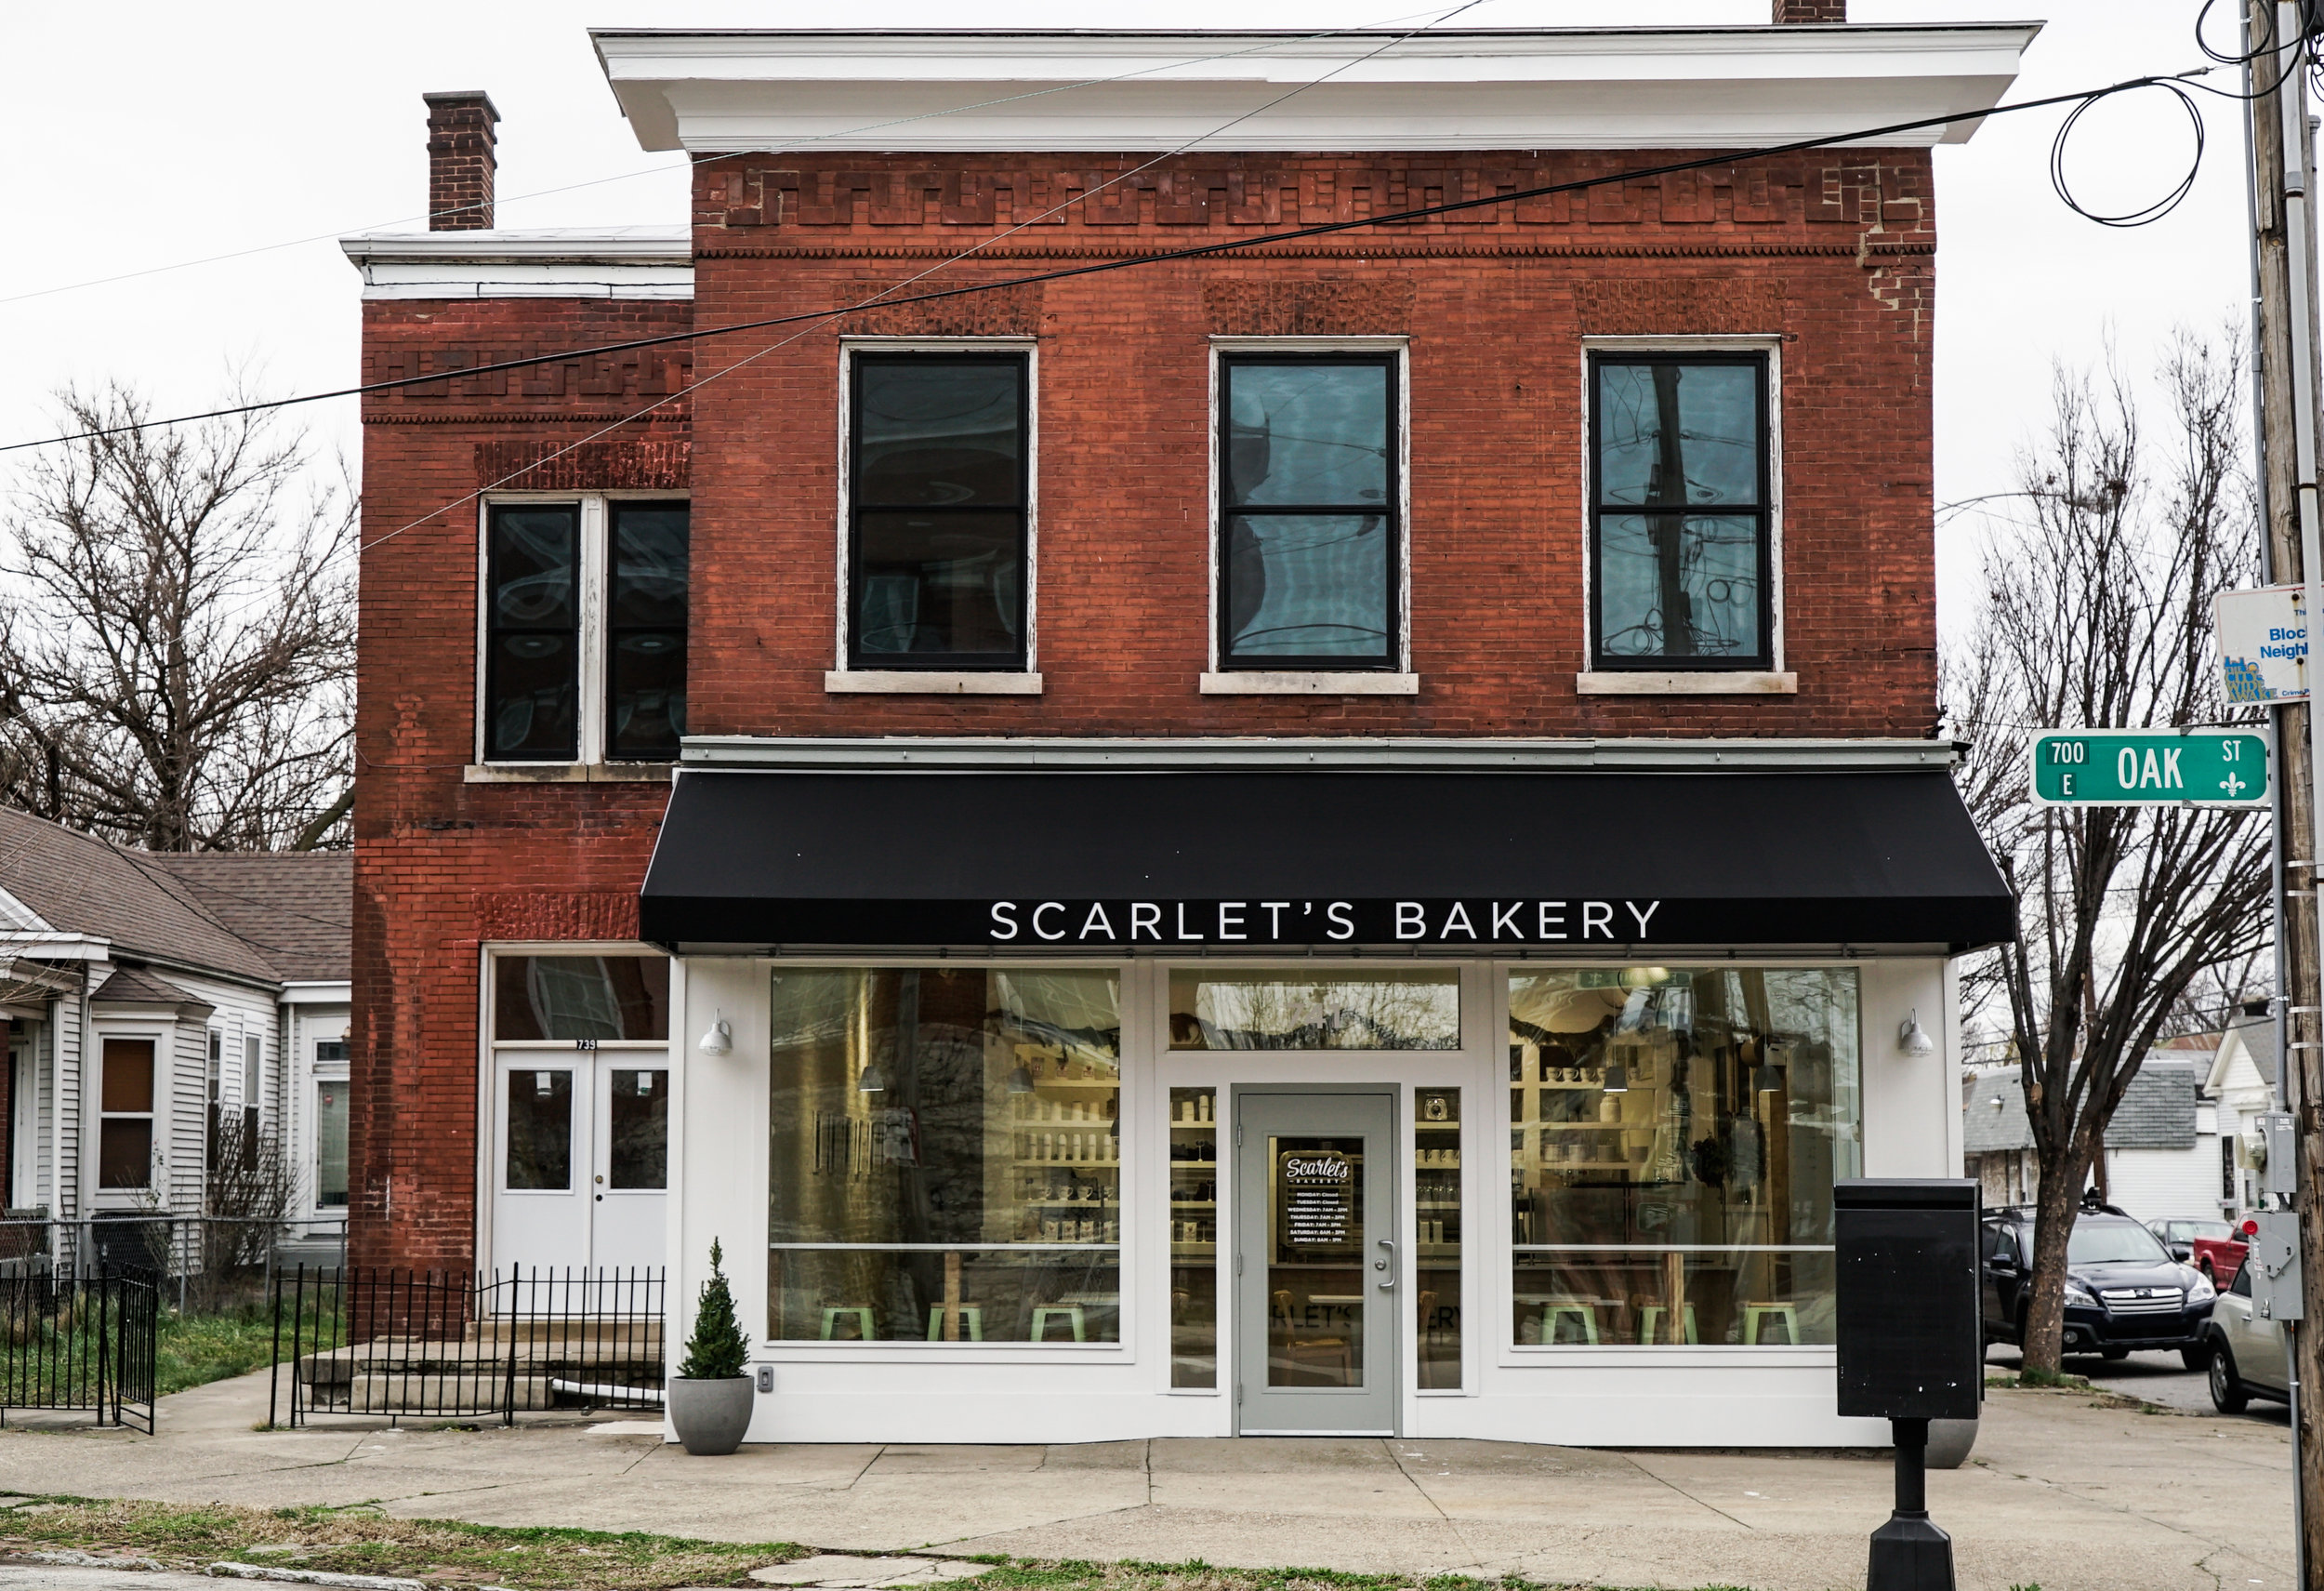 Scarlet's-Bakery-37 (1).jpg